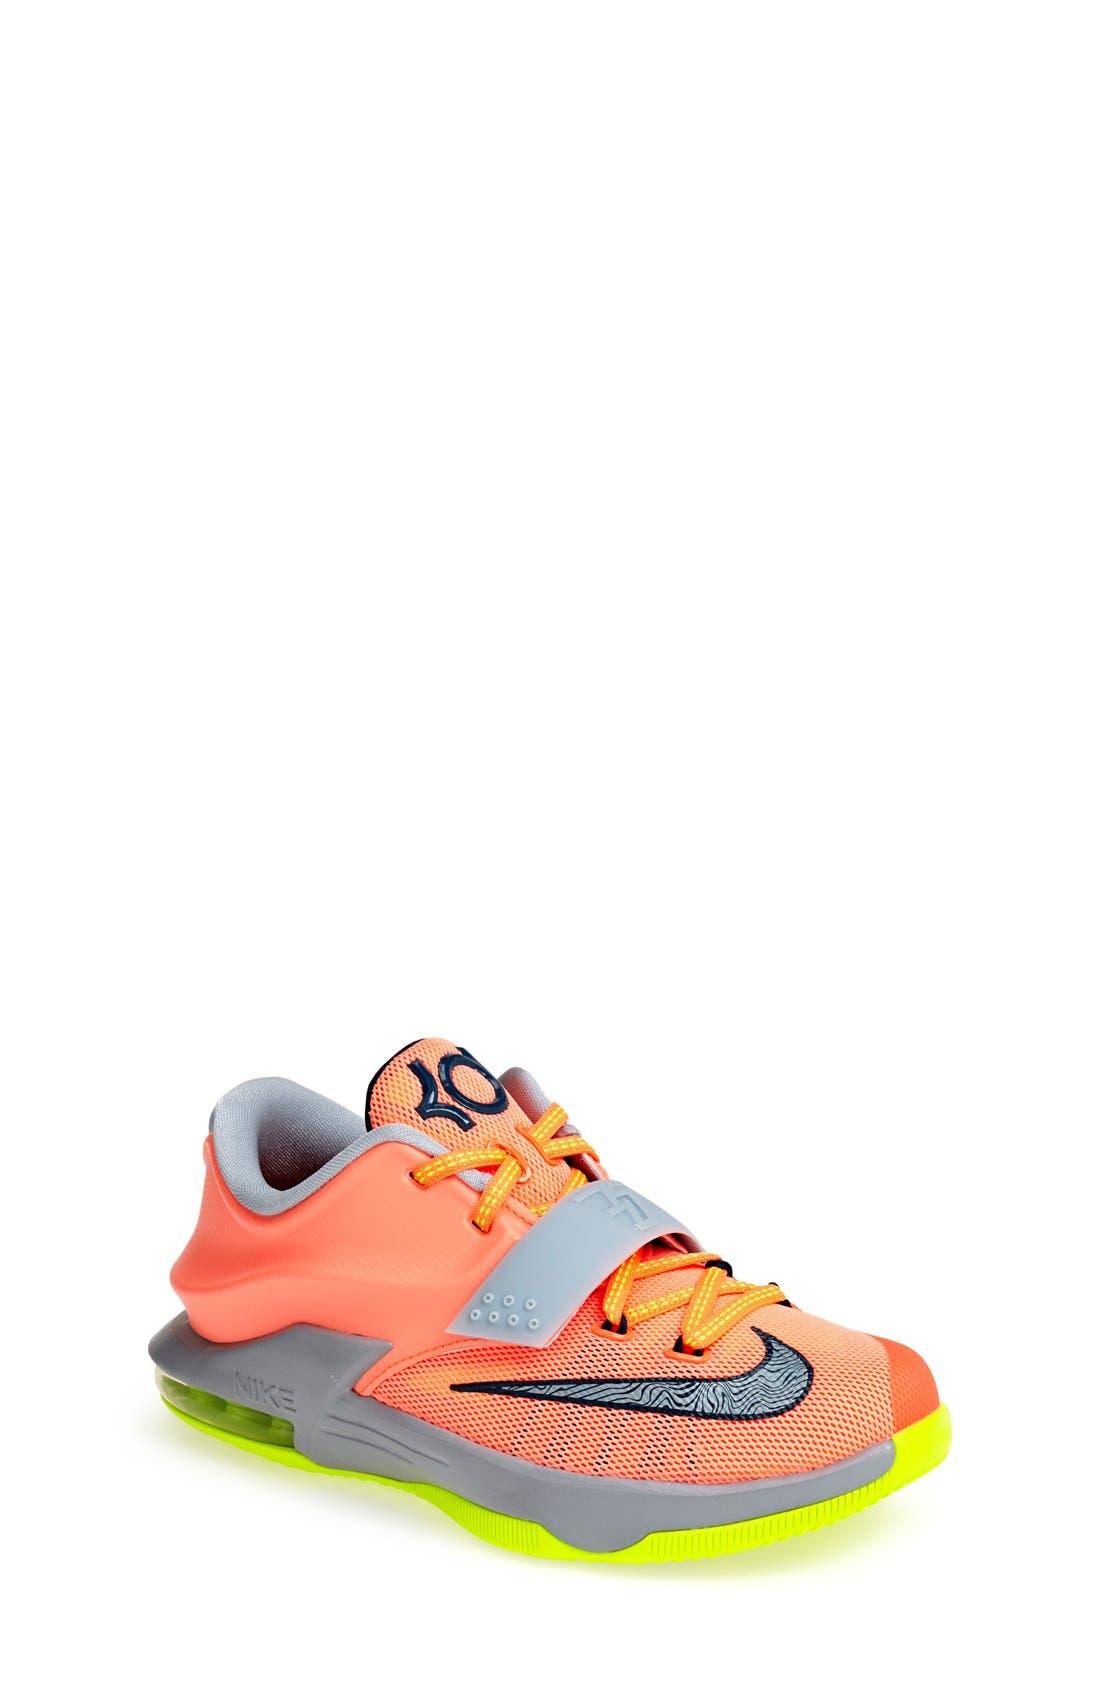 Main Image - Nike 'KD VII' Basketball Shoe ...